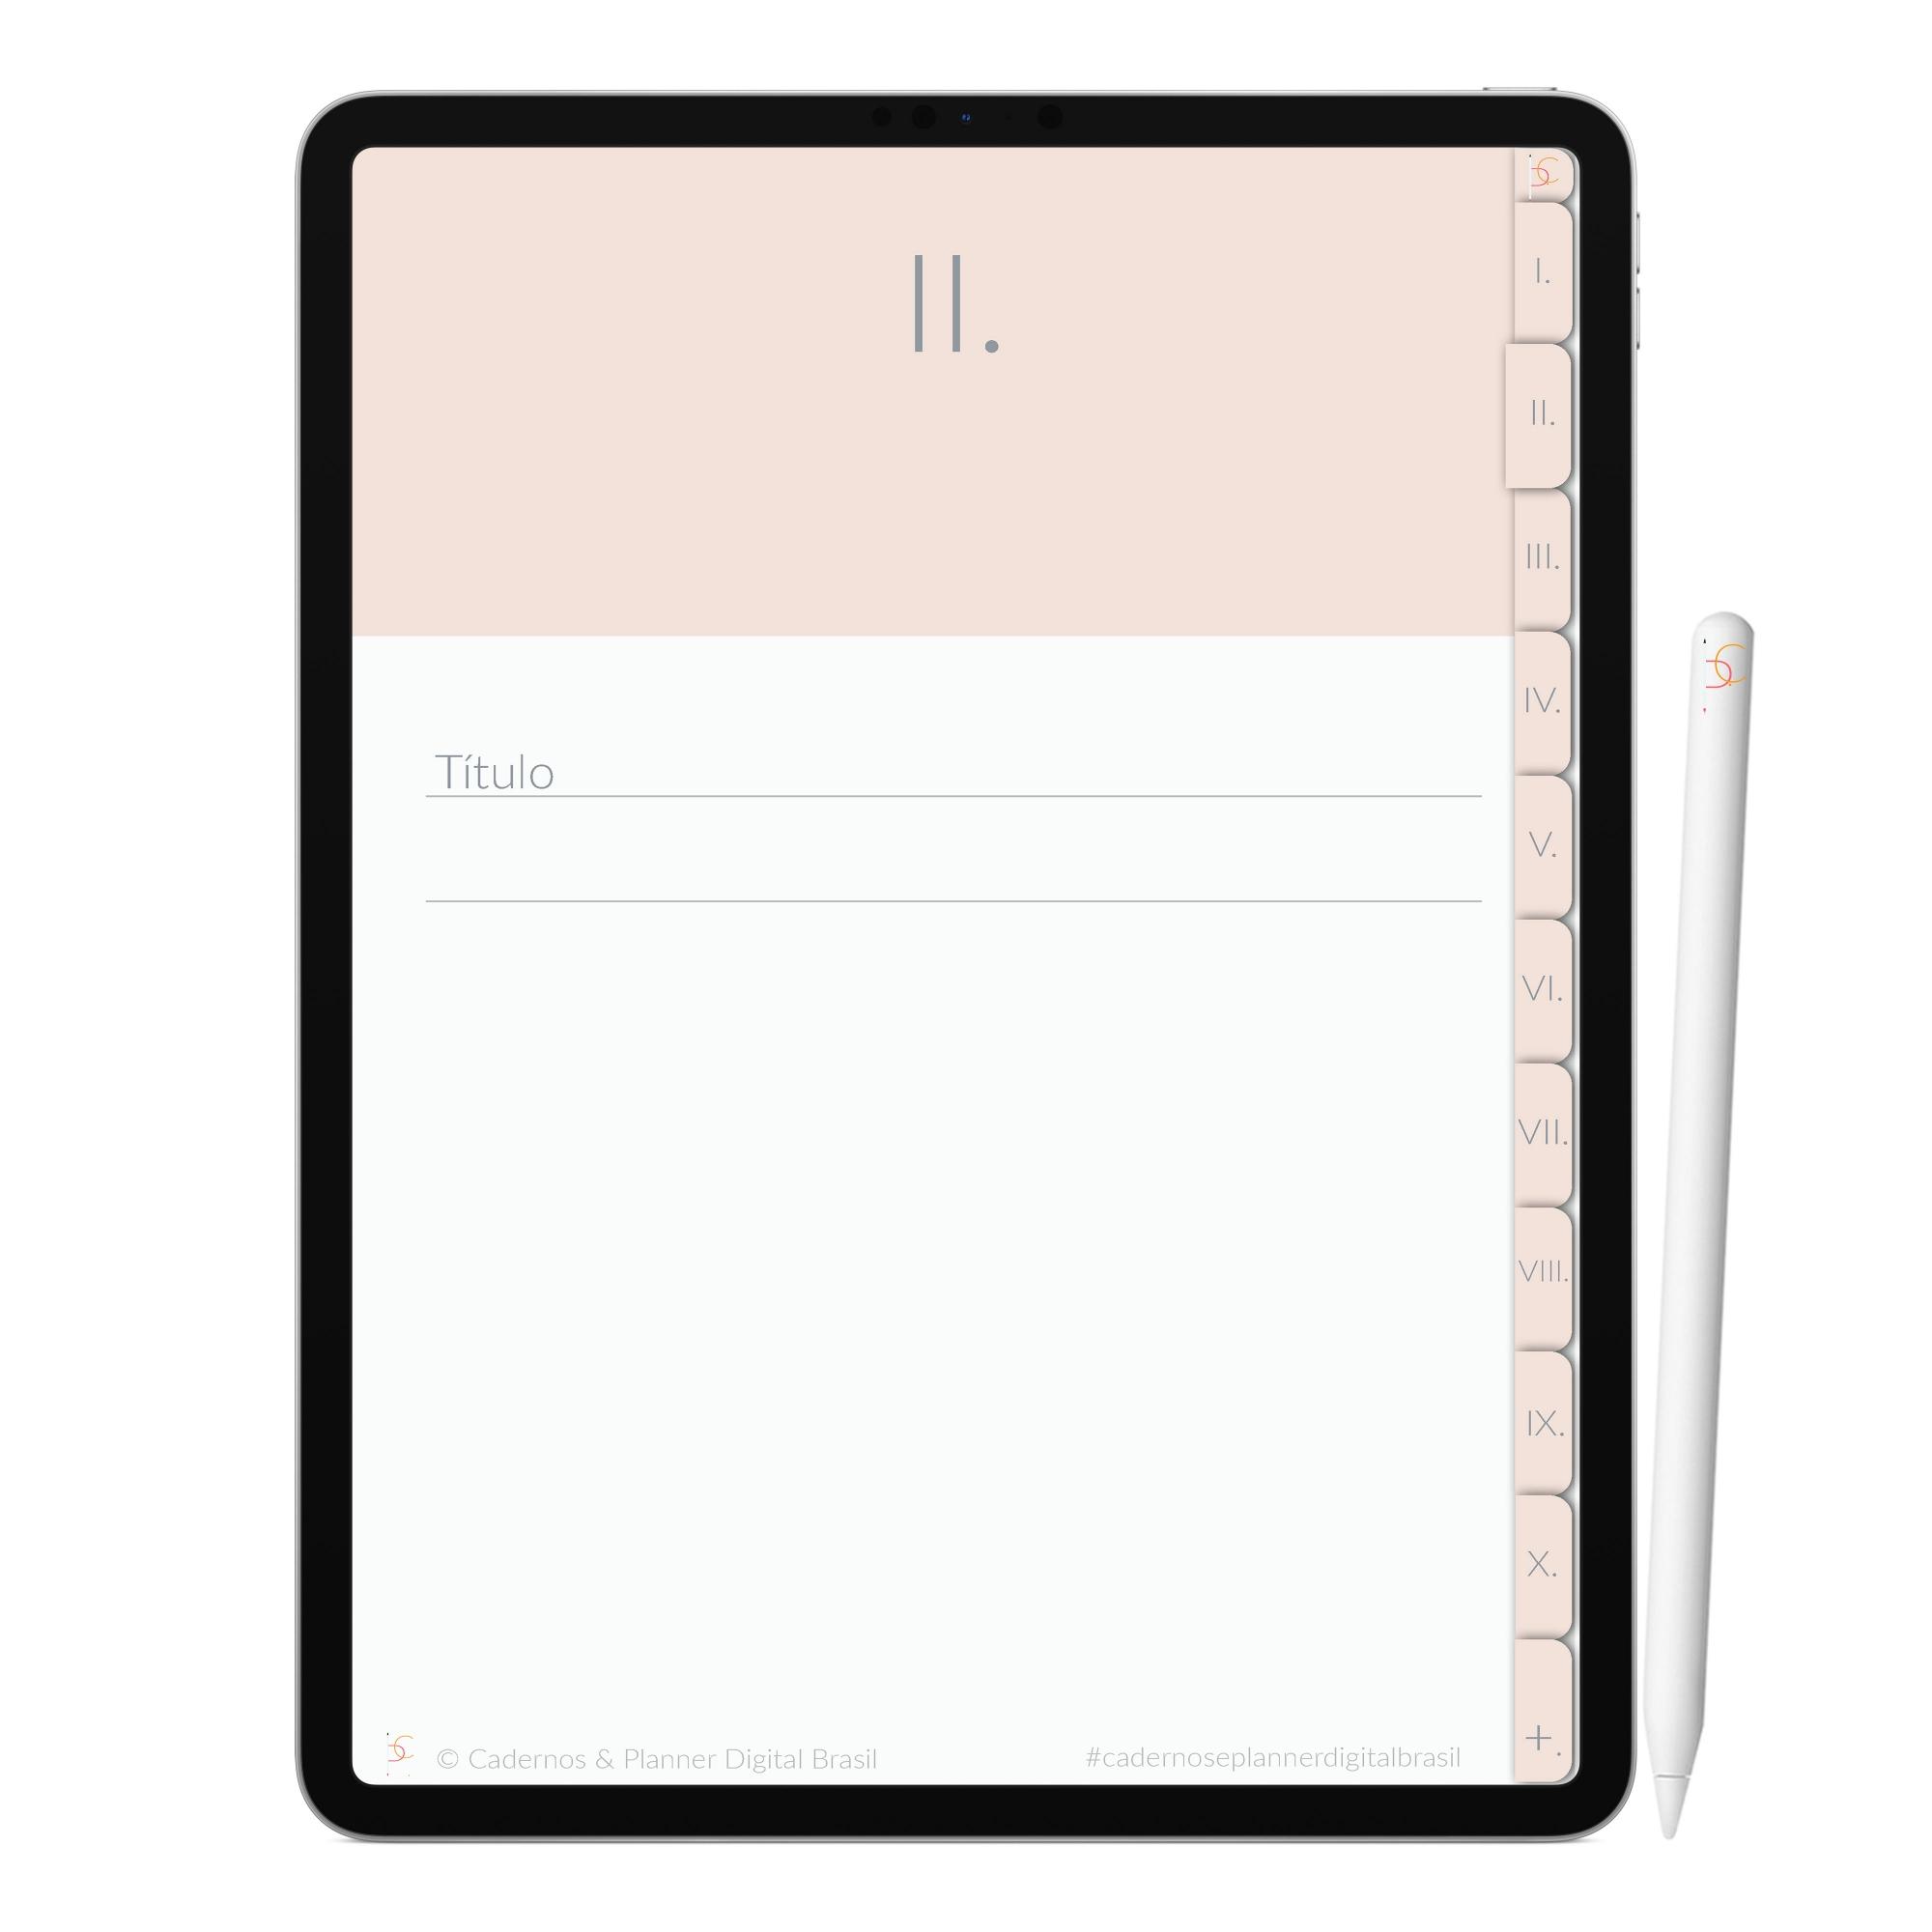 Caderno Digital Minimalista Pearl Pérola | Dez Divisórias Interativo| iPad Tablet | Download Instantâneo